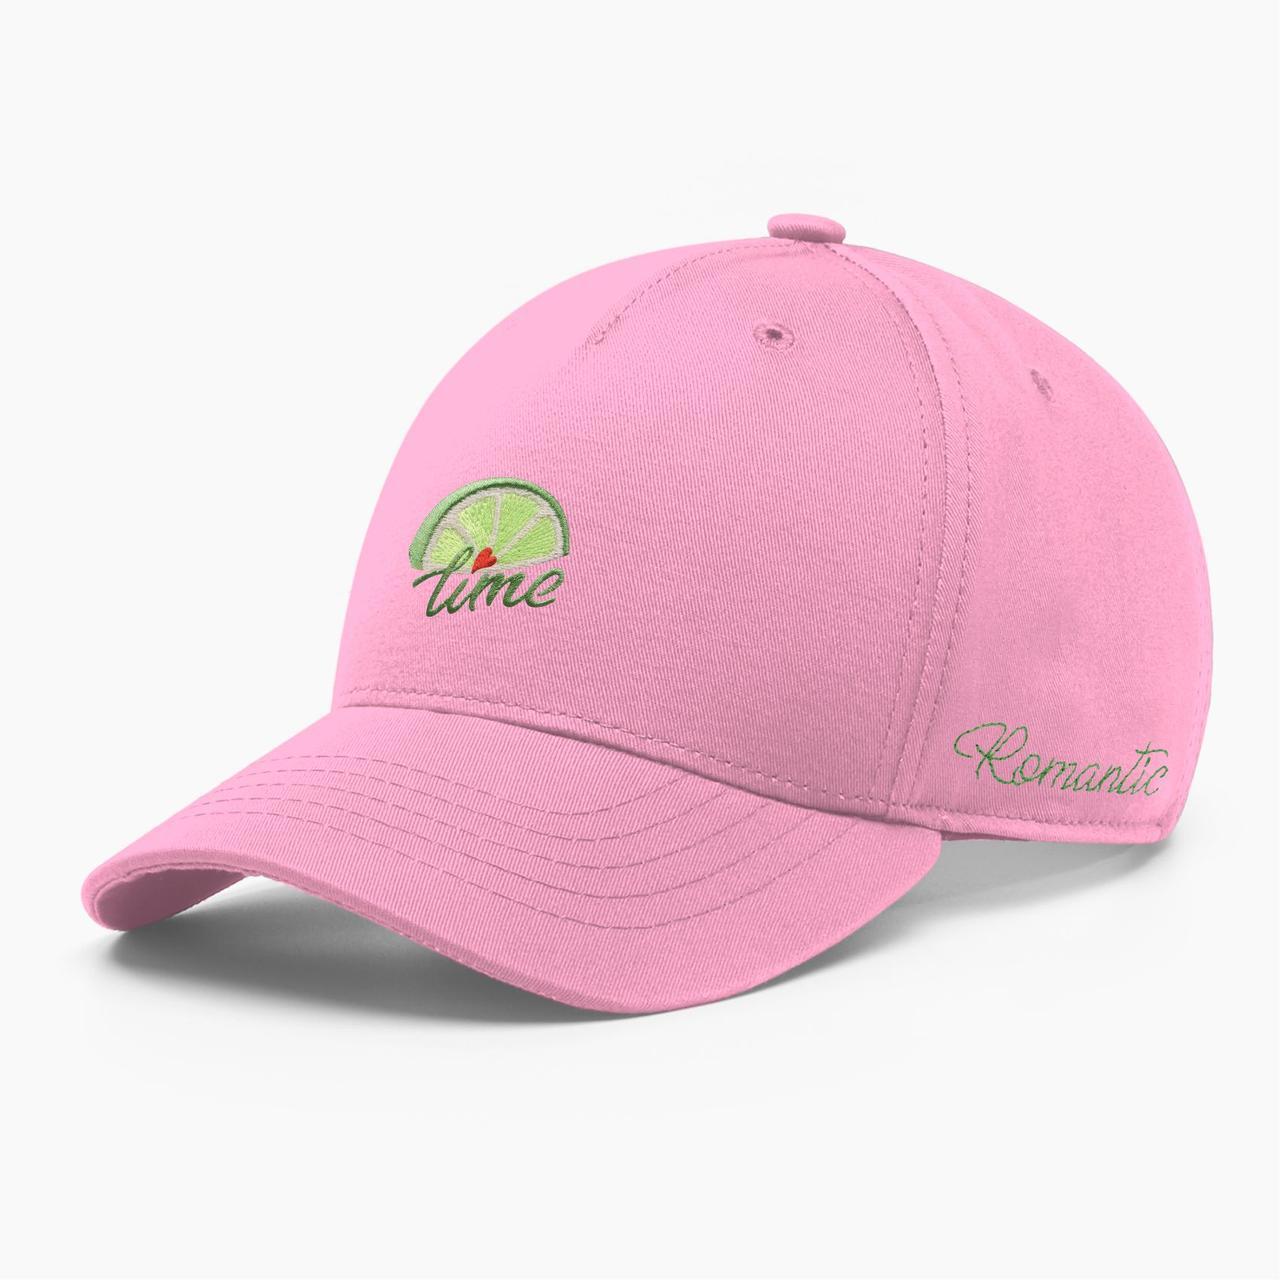 Женская кепка бейсболка INAL лайм S / 53-54 RU Розовый 285653